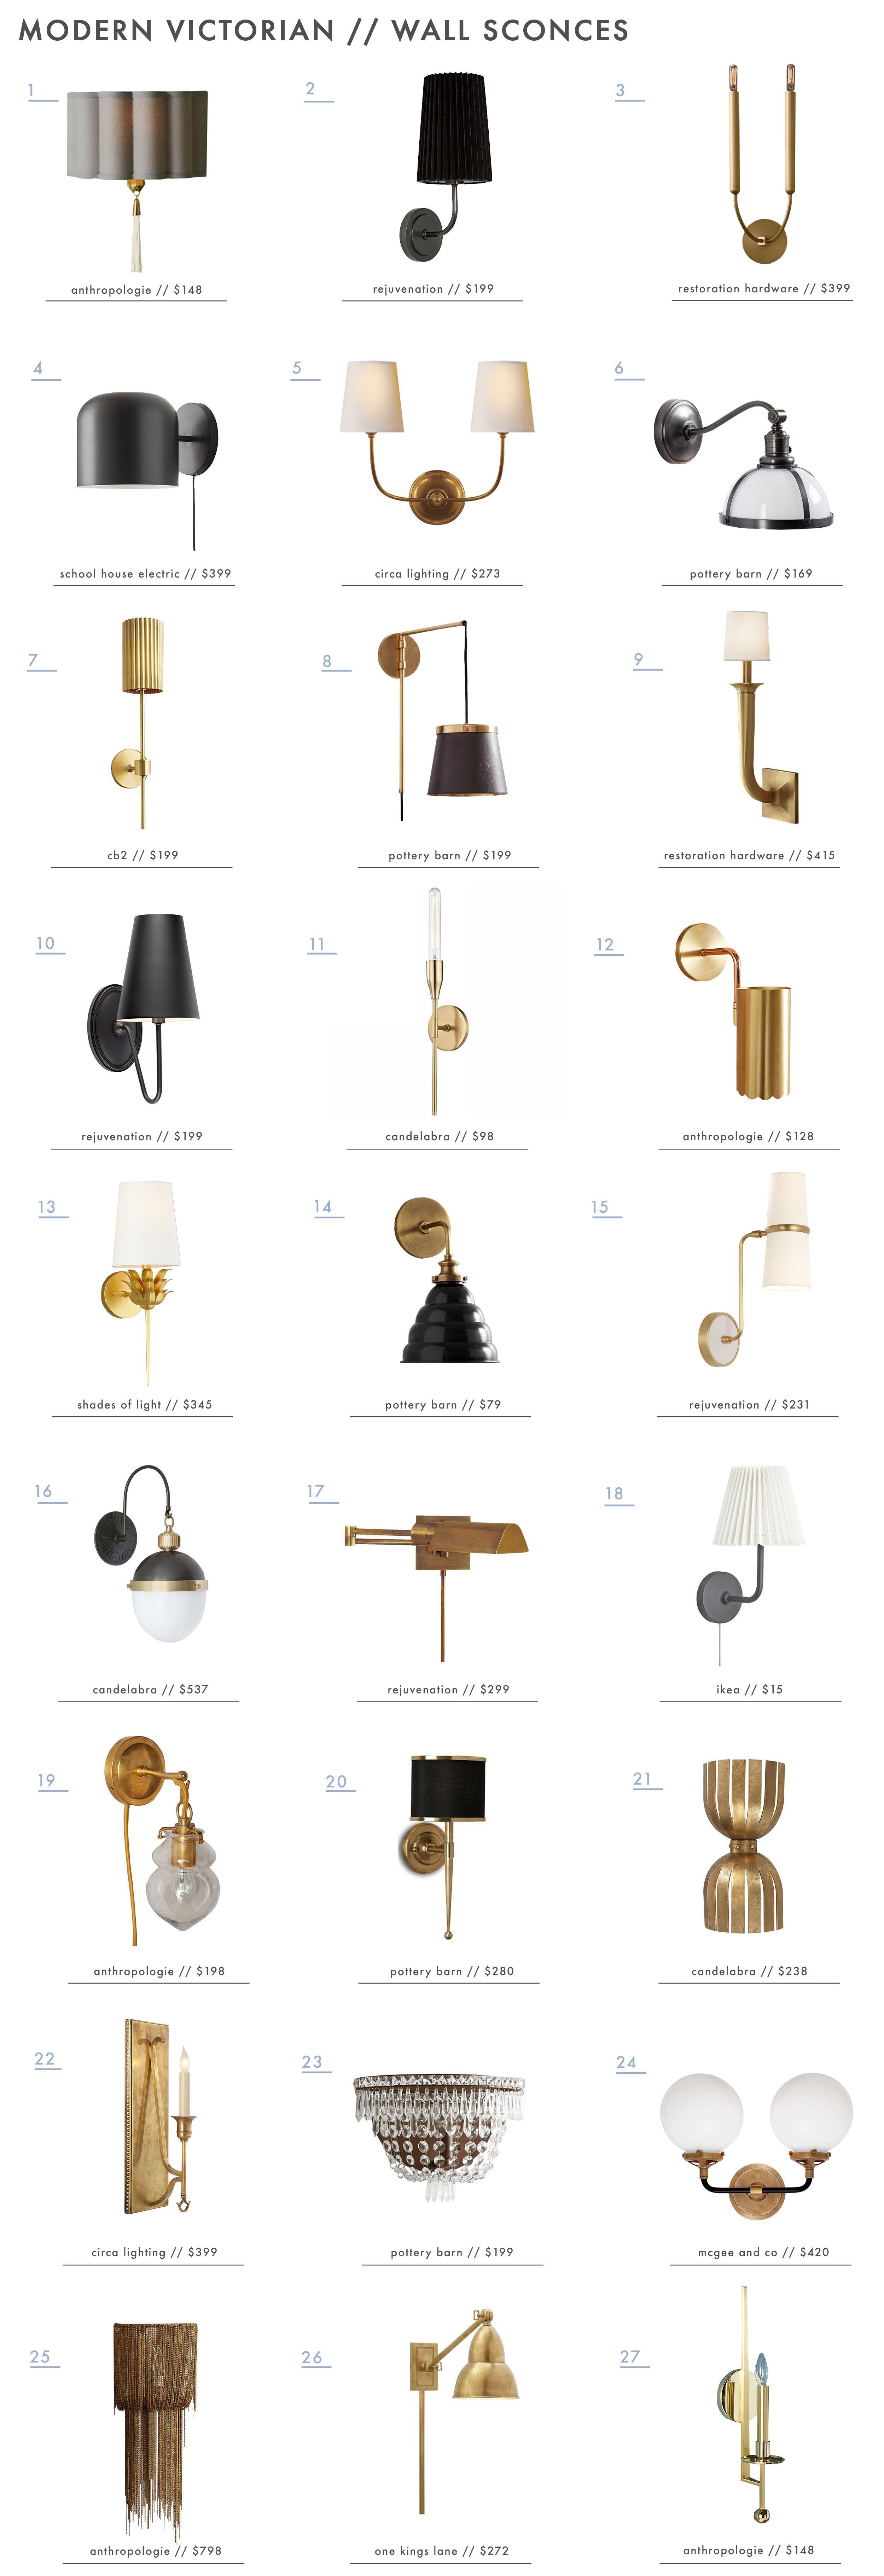 Modern Victorian Style: Lighting + Shop Our Picks - Emily Henderson